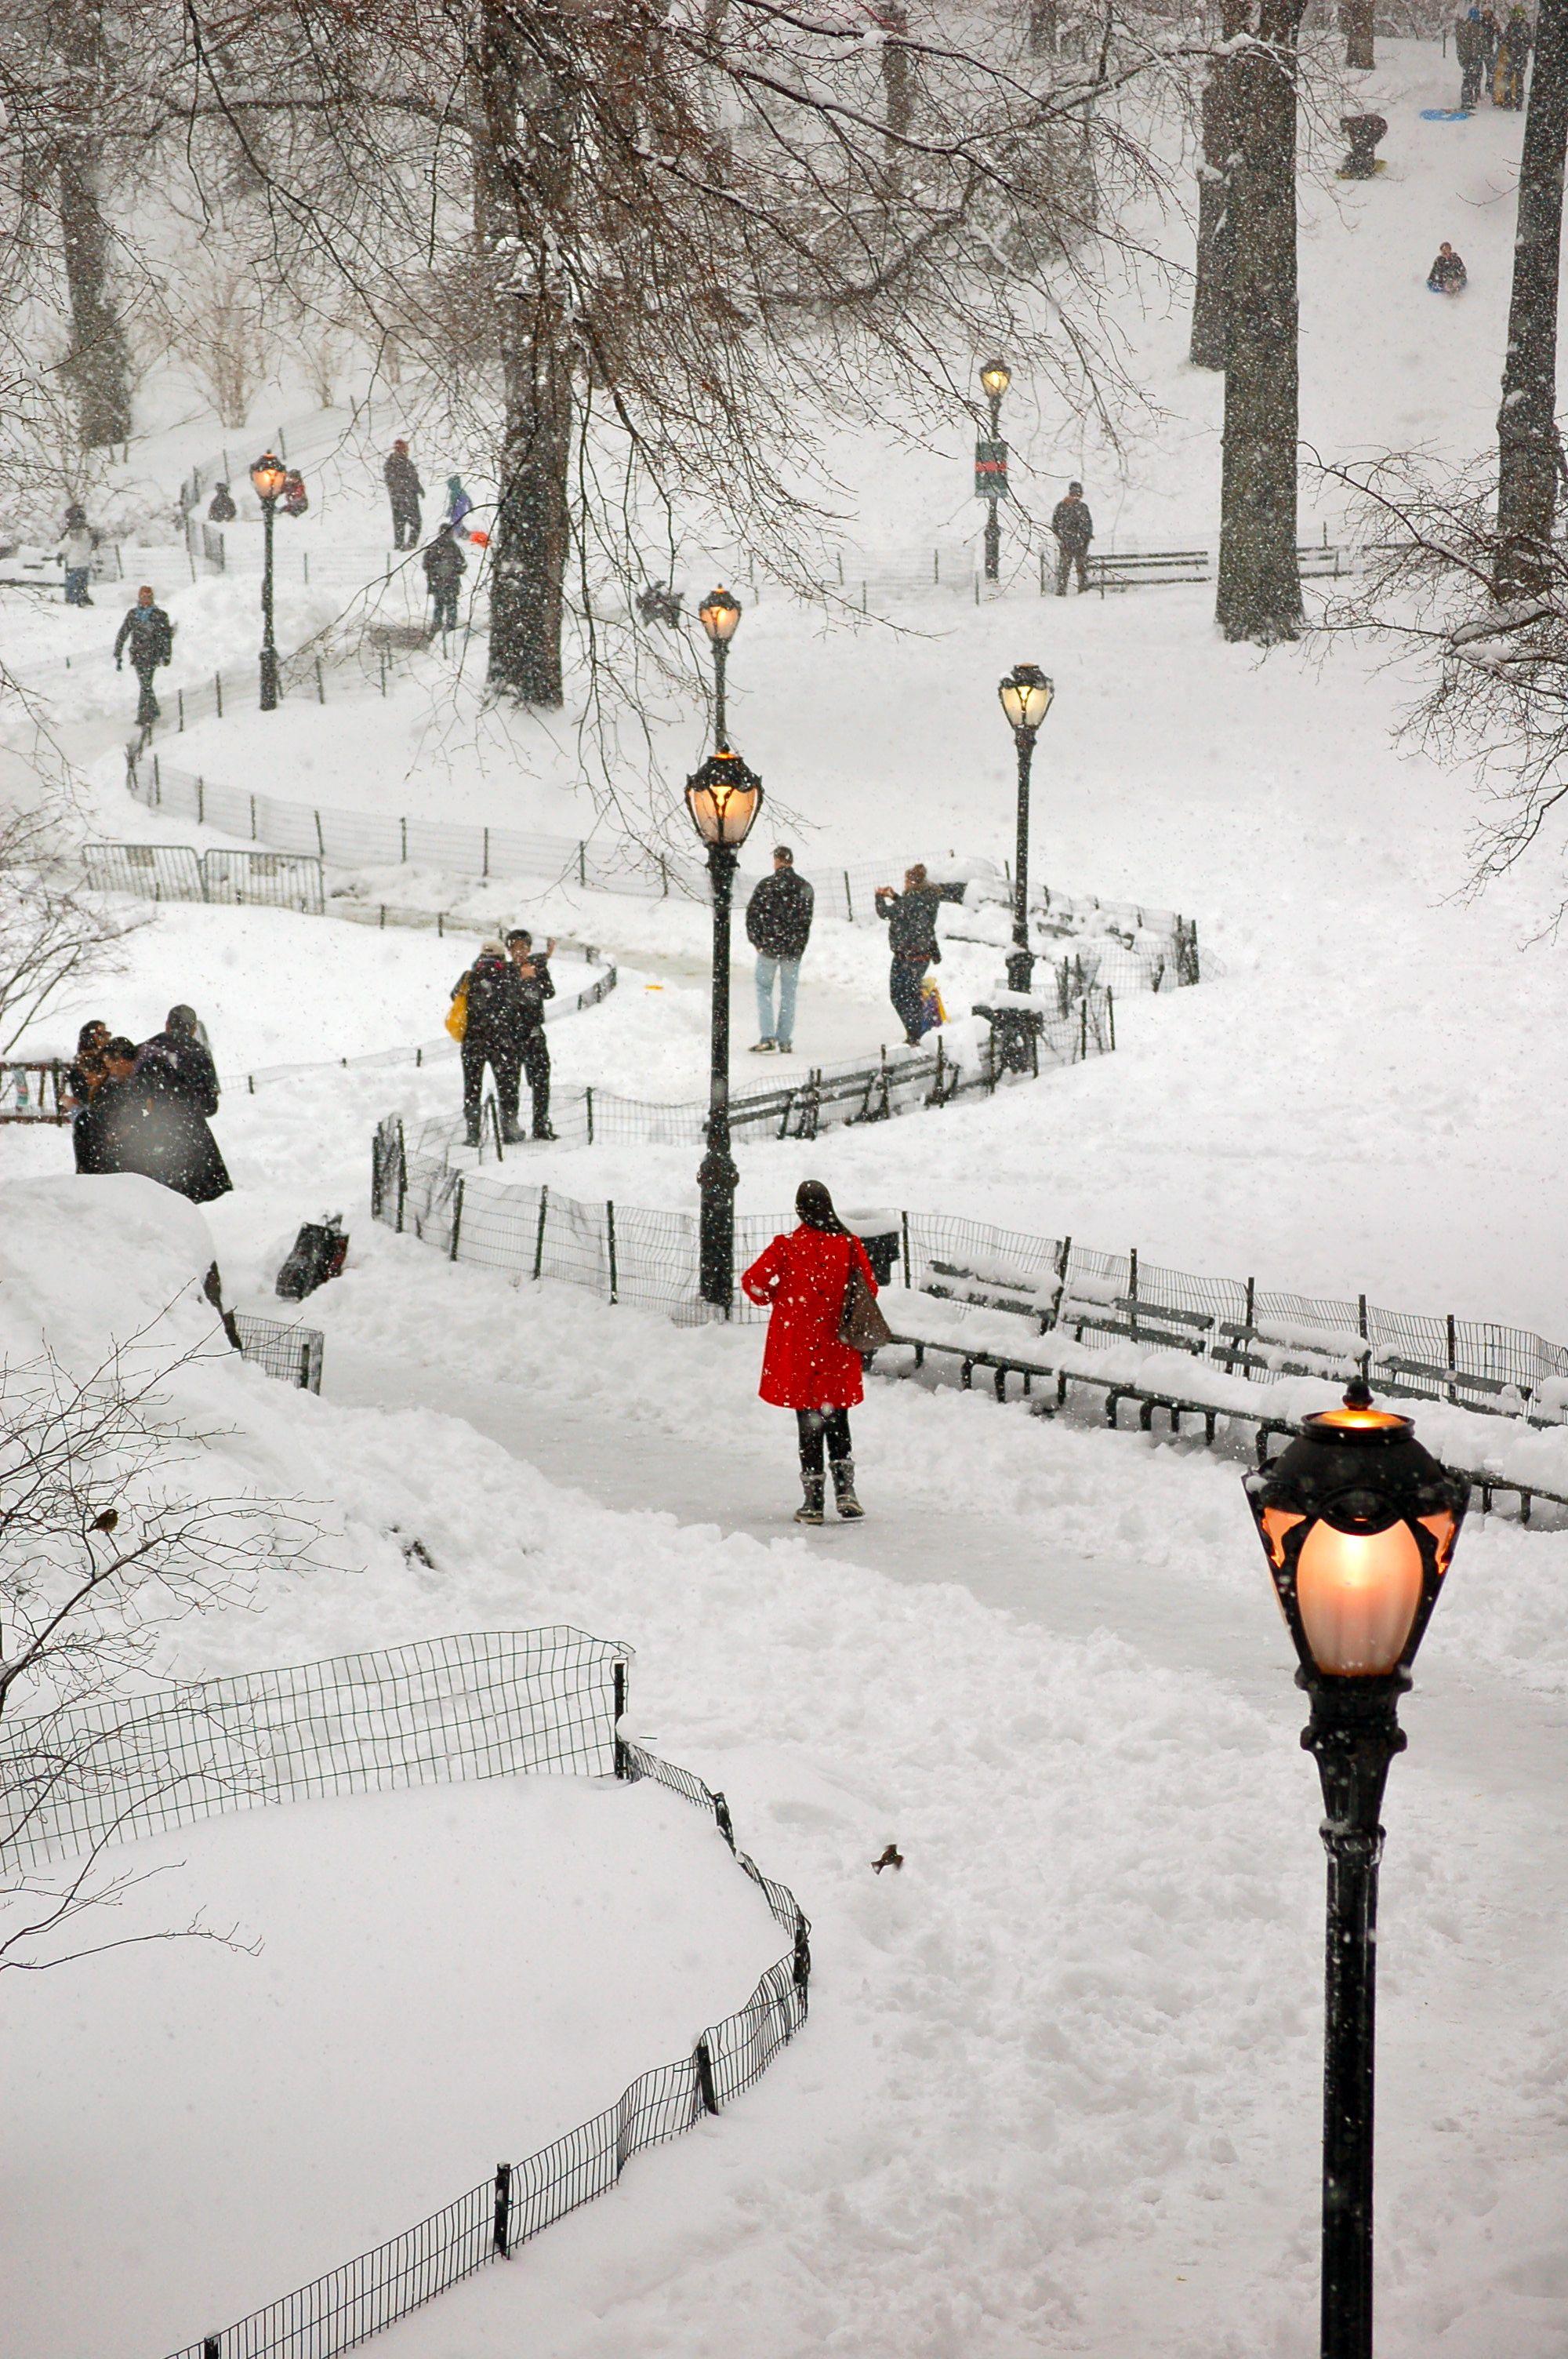 central park | Happy Nona | Pinterest | Central park, Park and Winter